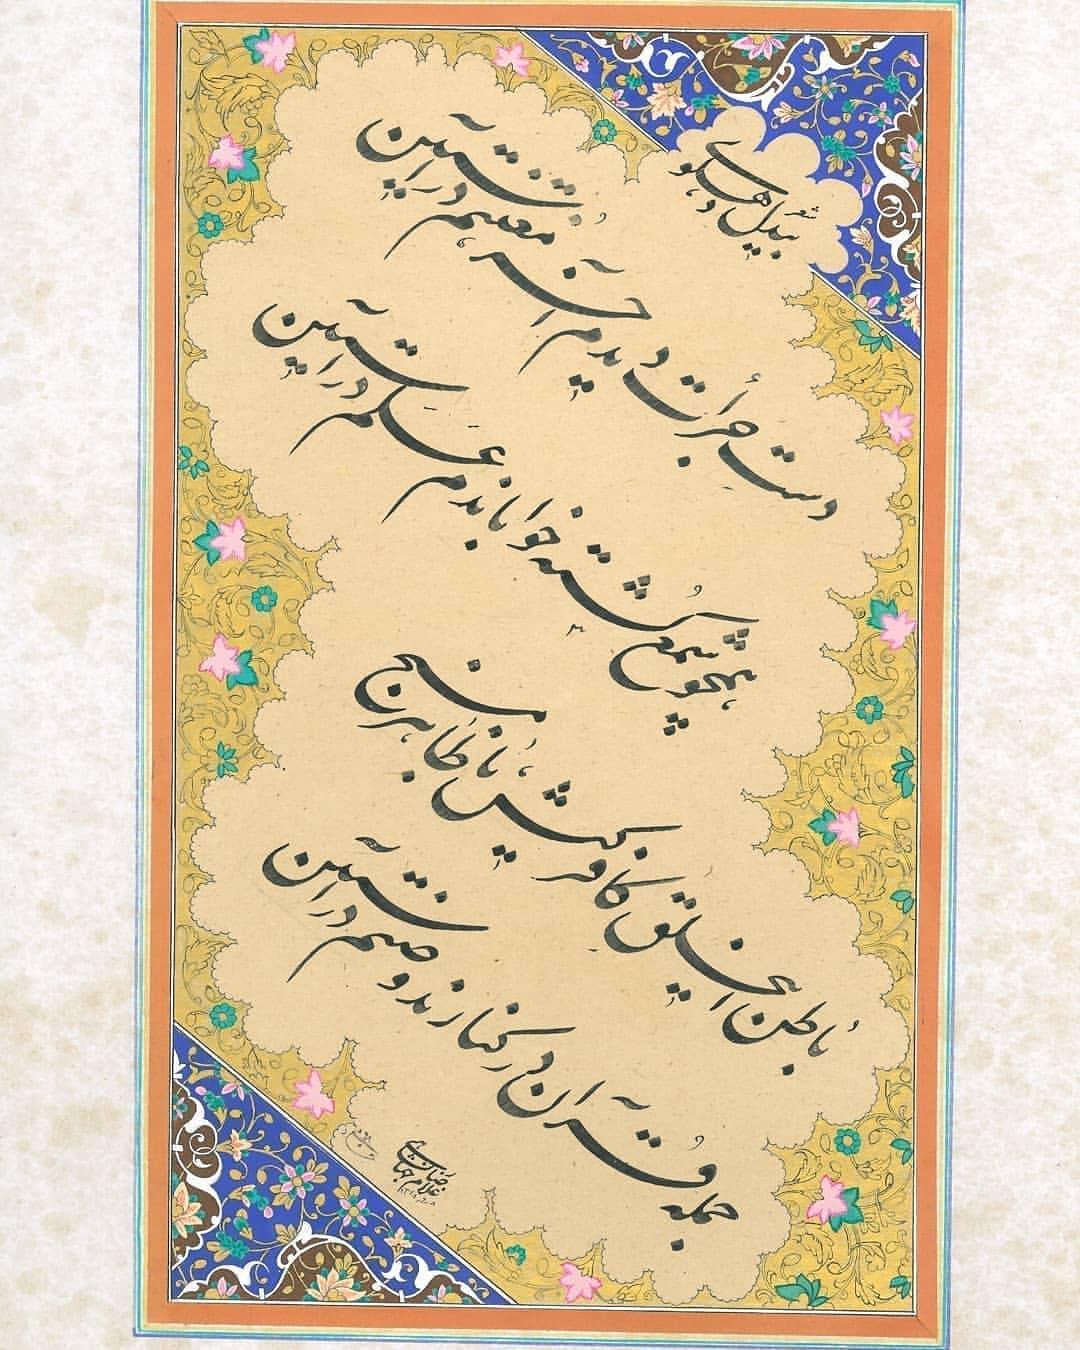 Download Photo Kaligrafi اثر زیبای استاد غلامرضا جهانشاهی @gholamrezajahanshahi با تذهیب هنرمند گرامی سر…- Vahedi Masoud